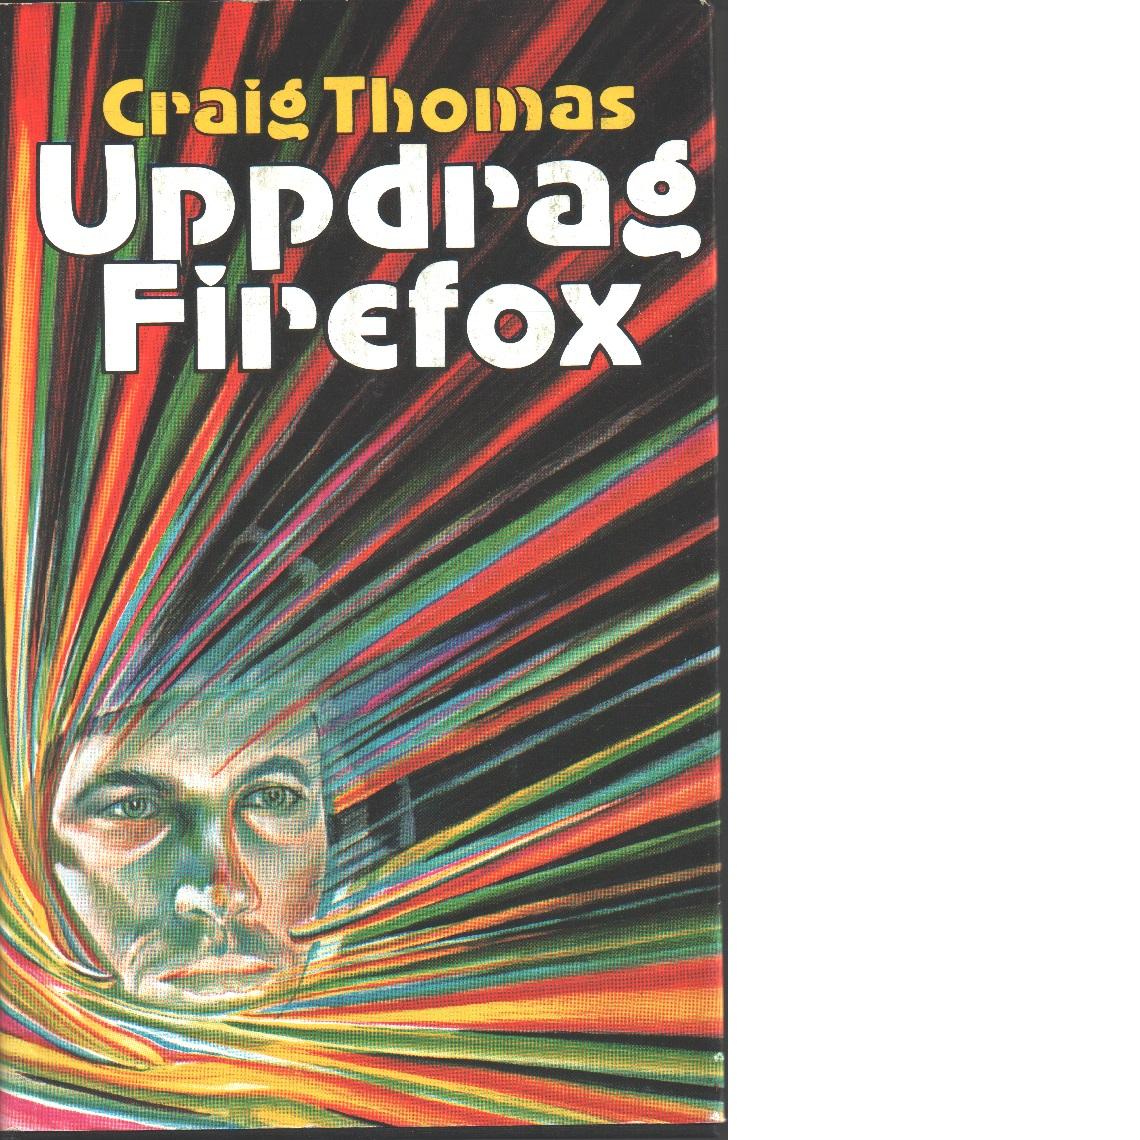 Uppdrag Firefox - Thomas, Craig